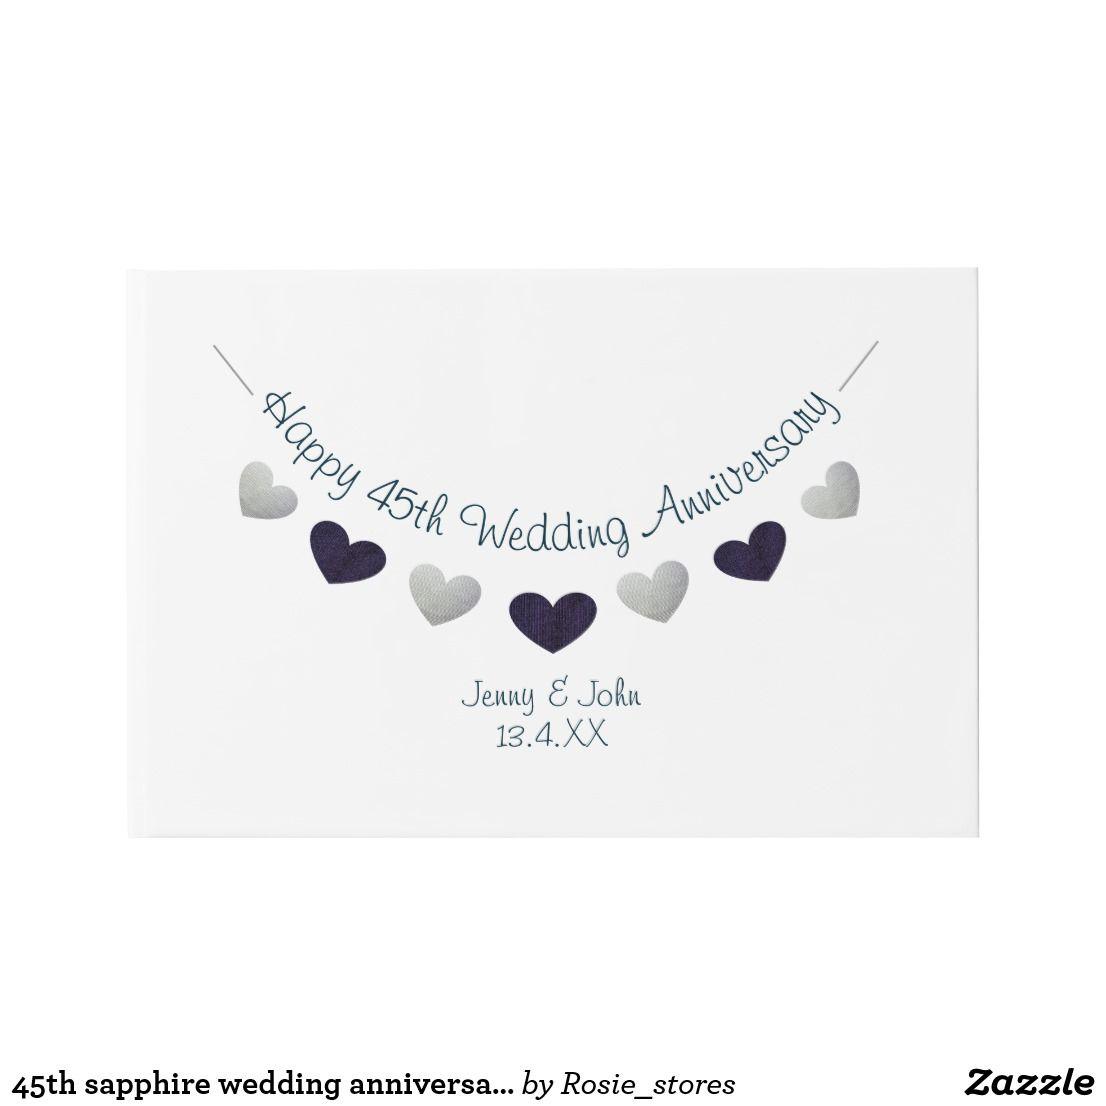 45th sapphire wedding anniversary bunting design guest